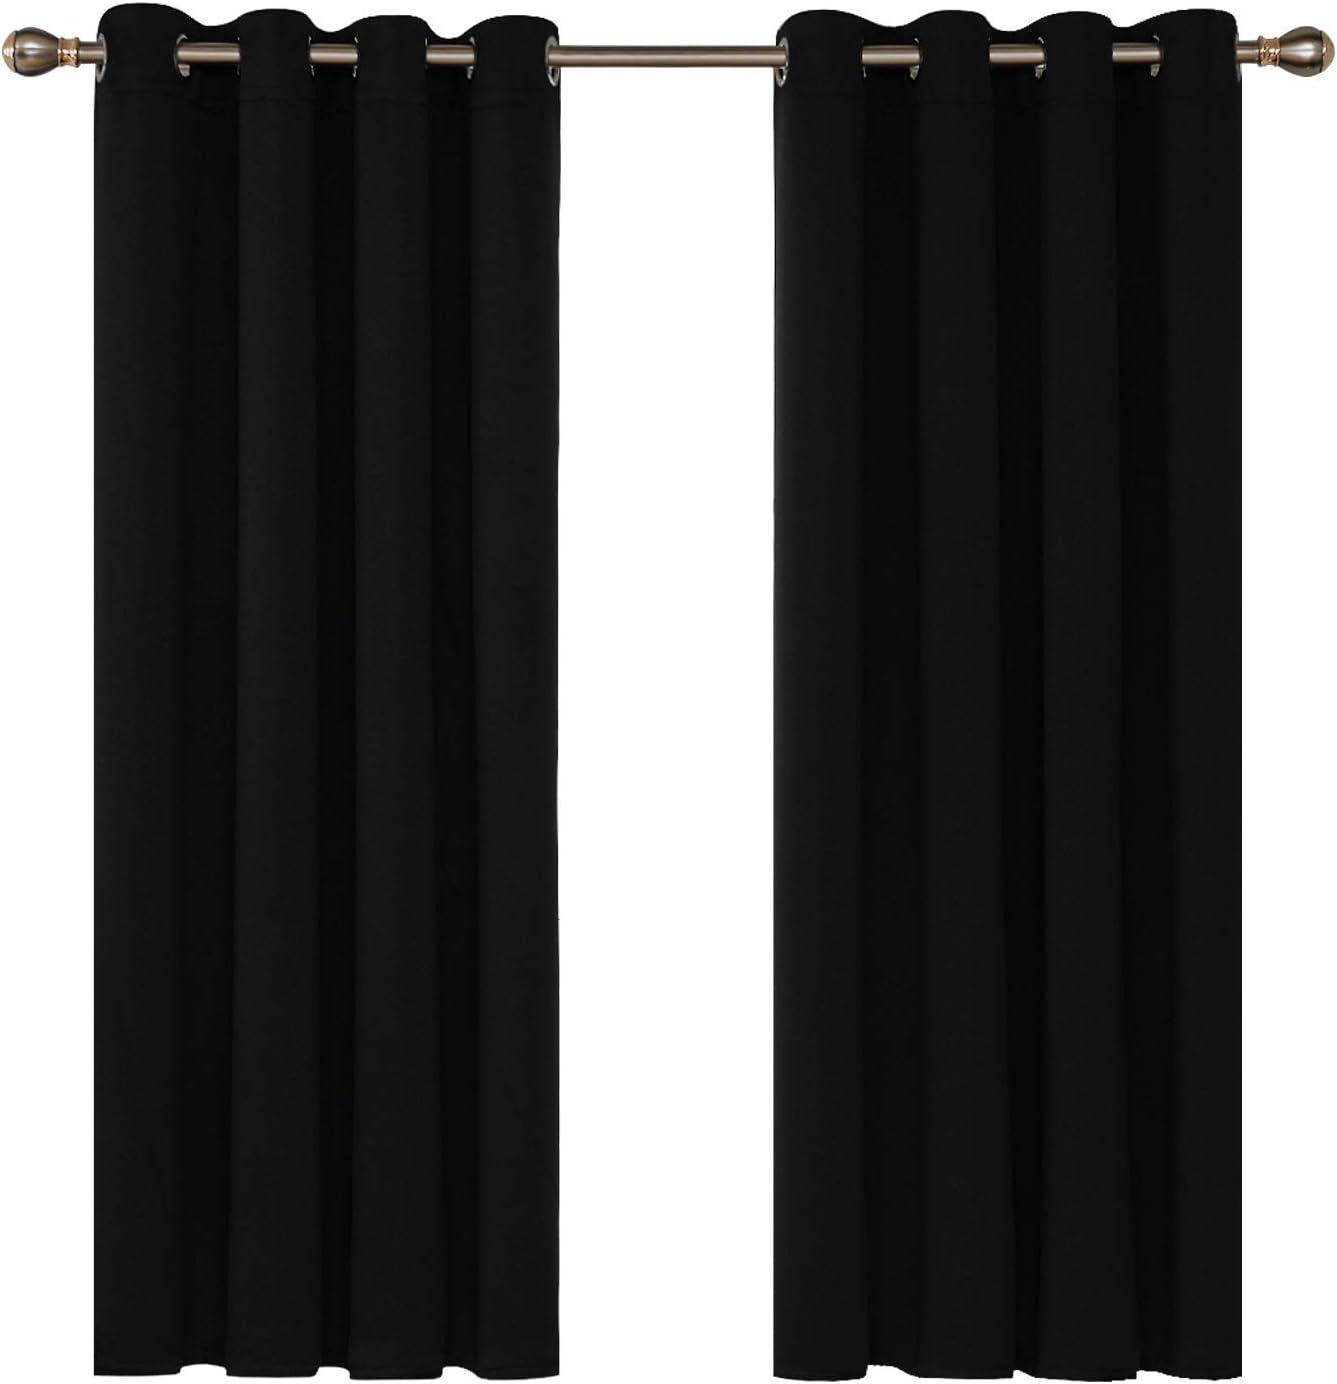 Deconovo Cortinas Opacas para Ventanas de Salón y Cocina con Ojales Aislamiento Térmico 2 Paneles 140 x 180 cm Negro